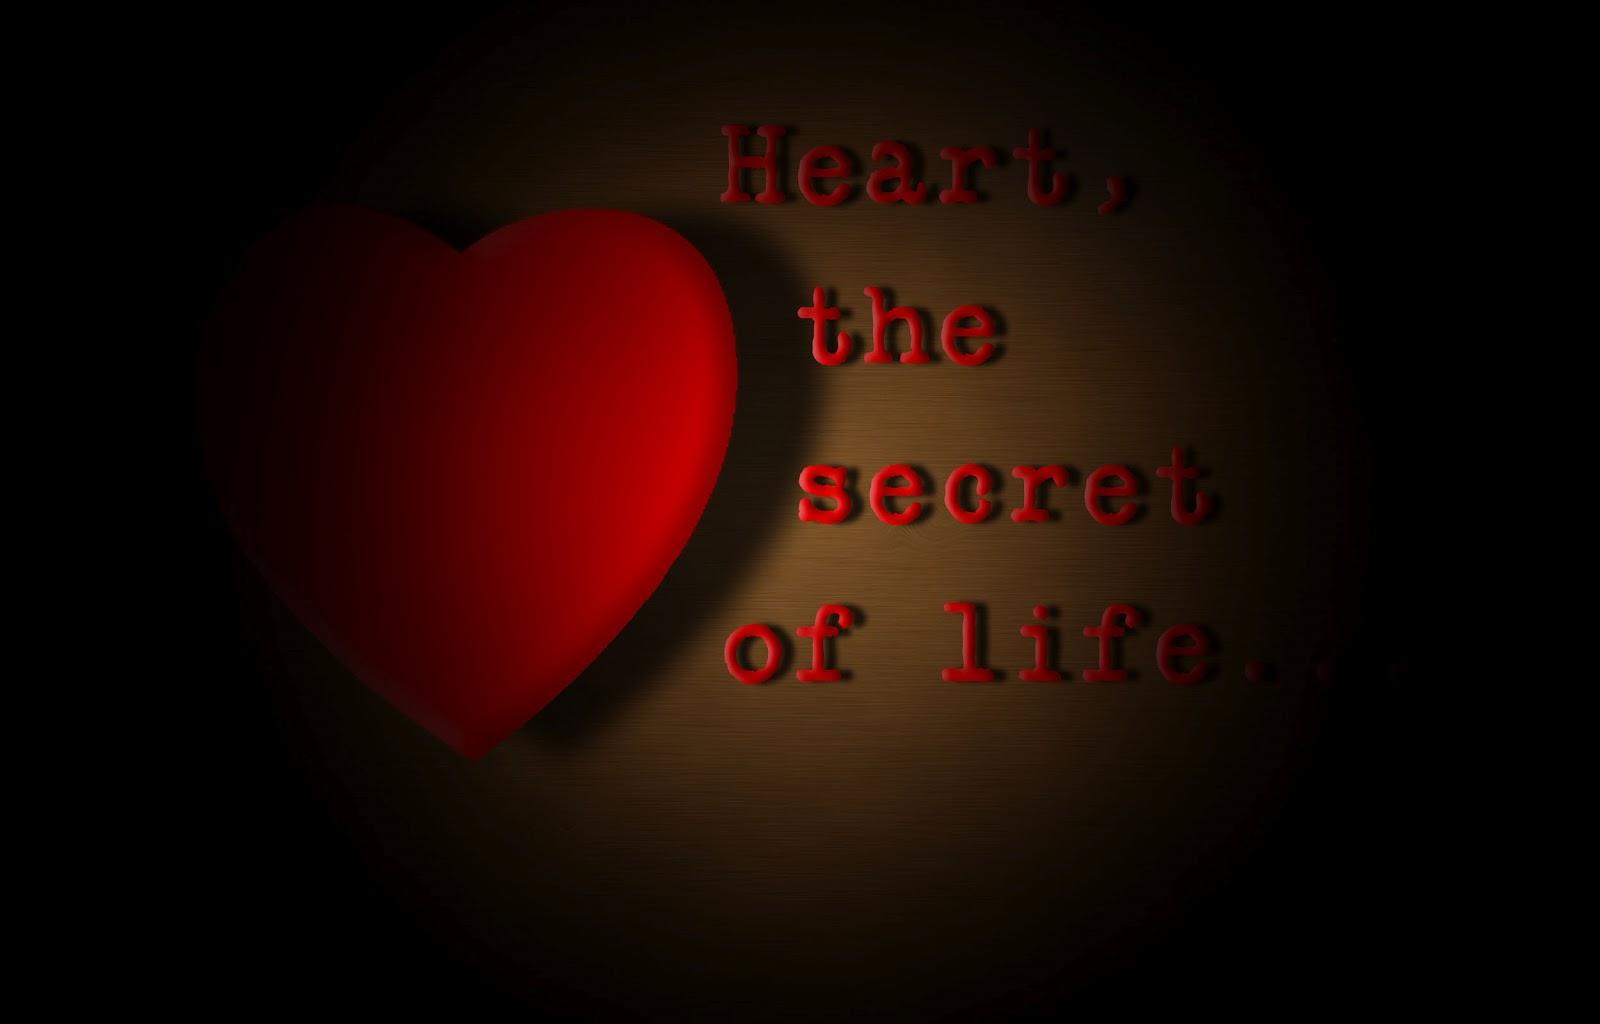 http://1.bp.blogspot.com/-BoyEMugdkU0/T6ed7C5qlLI/AAAAAAAAAFY/mXROTBfVRdg/s1600/heart,%2Bthe%2Bsecret%2Bof%2Blife.jpg